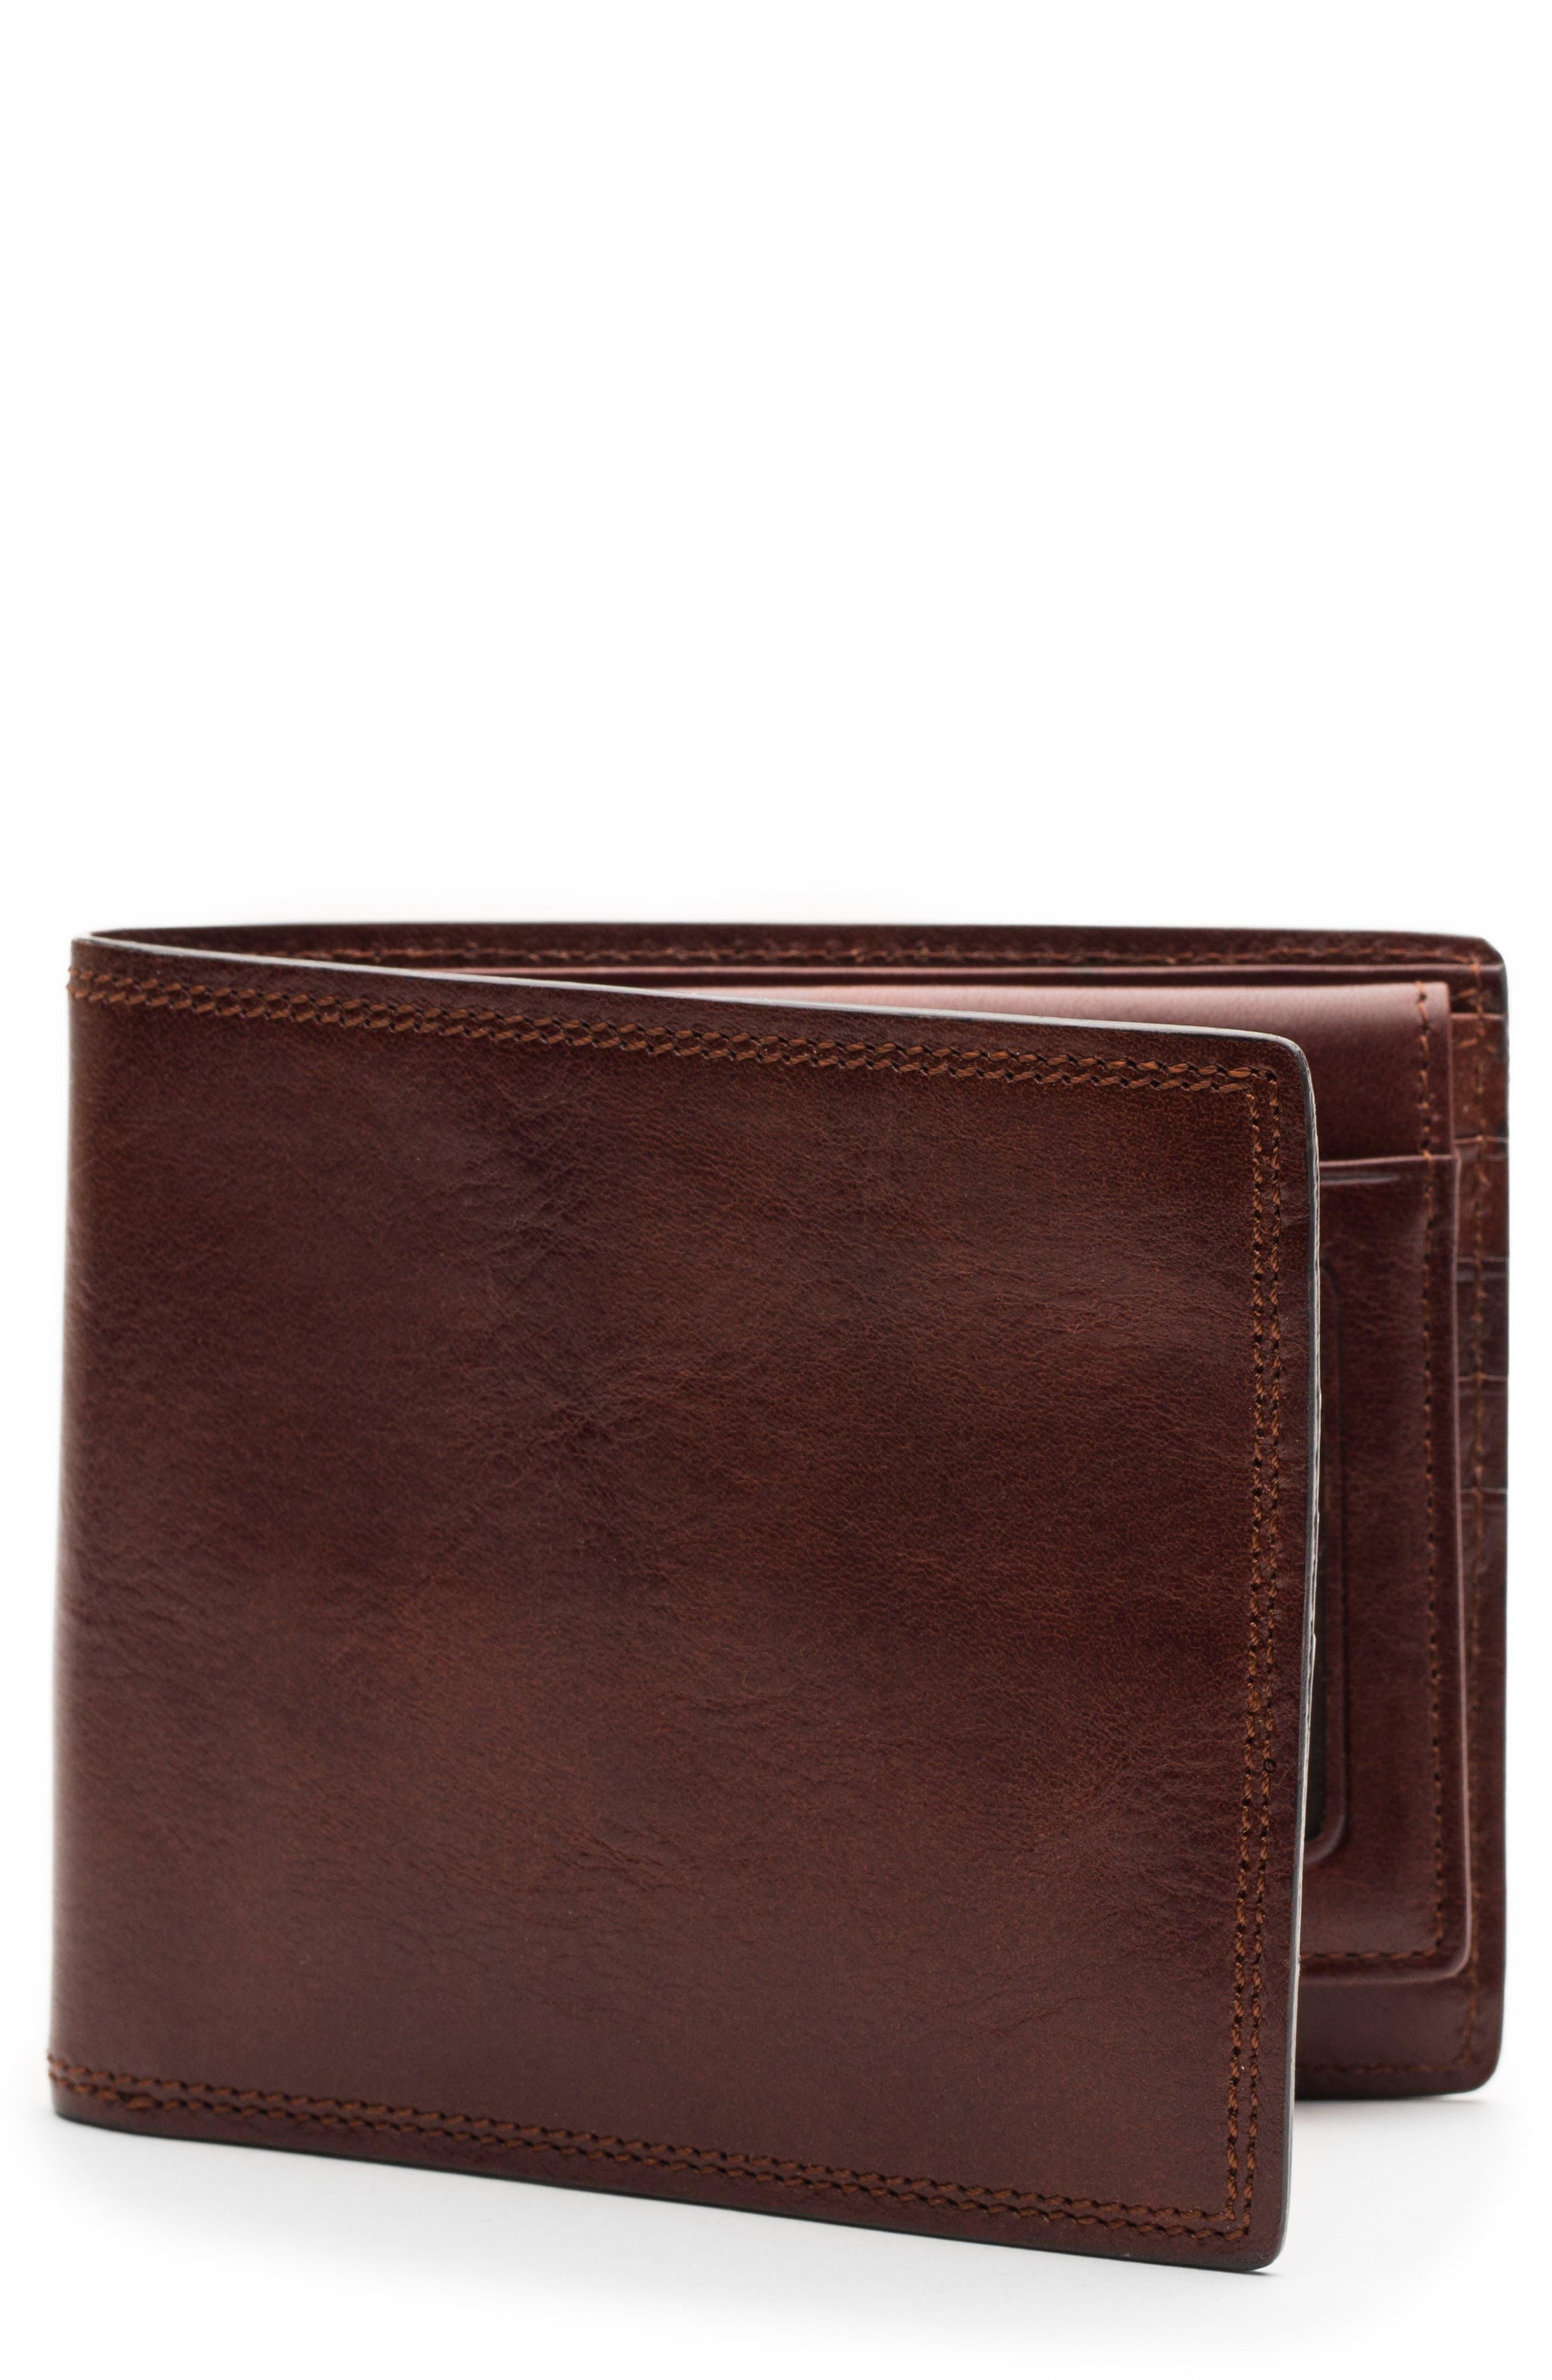 Bosca Dolce Leather Wallet